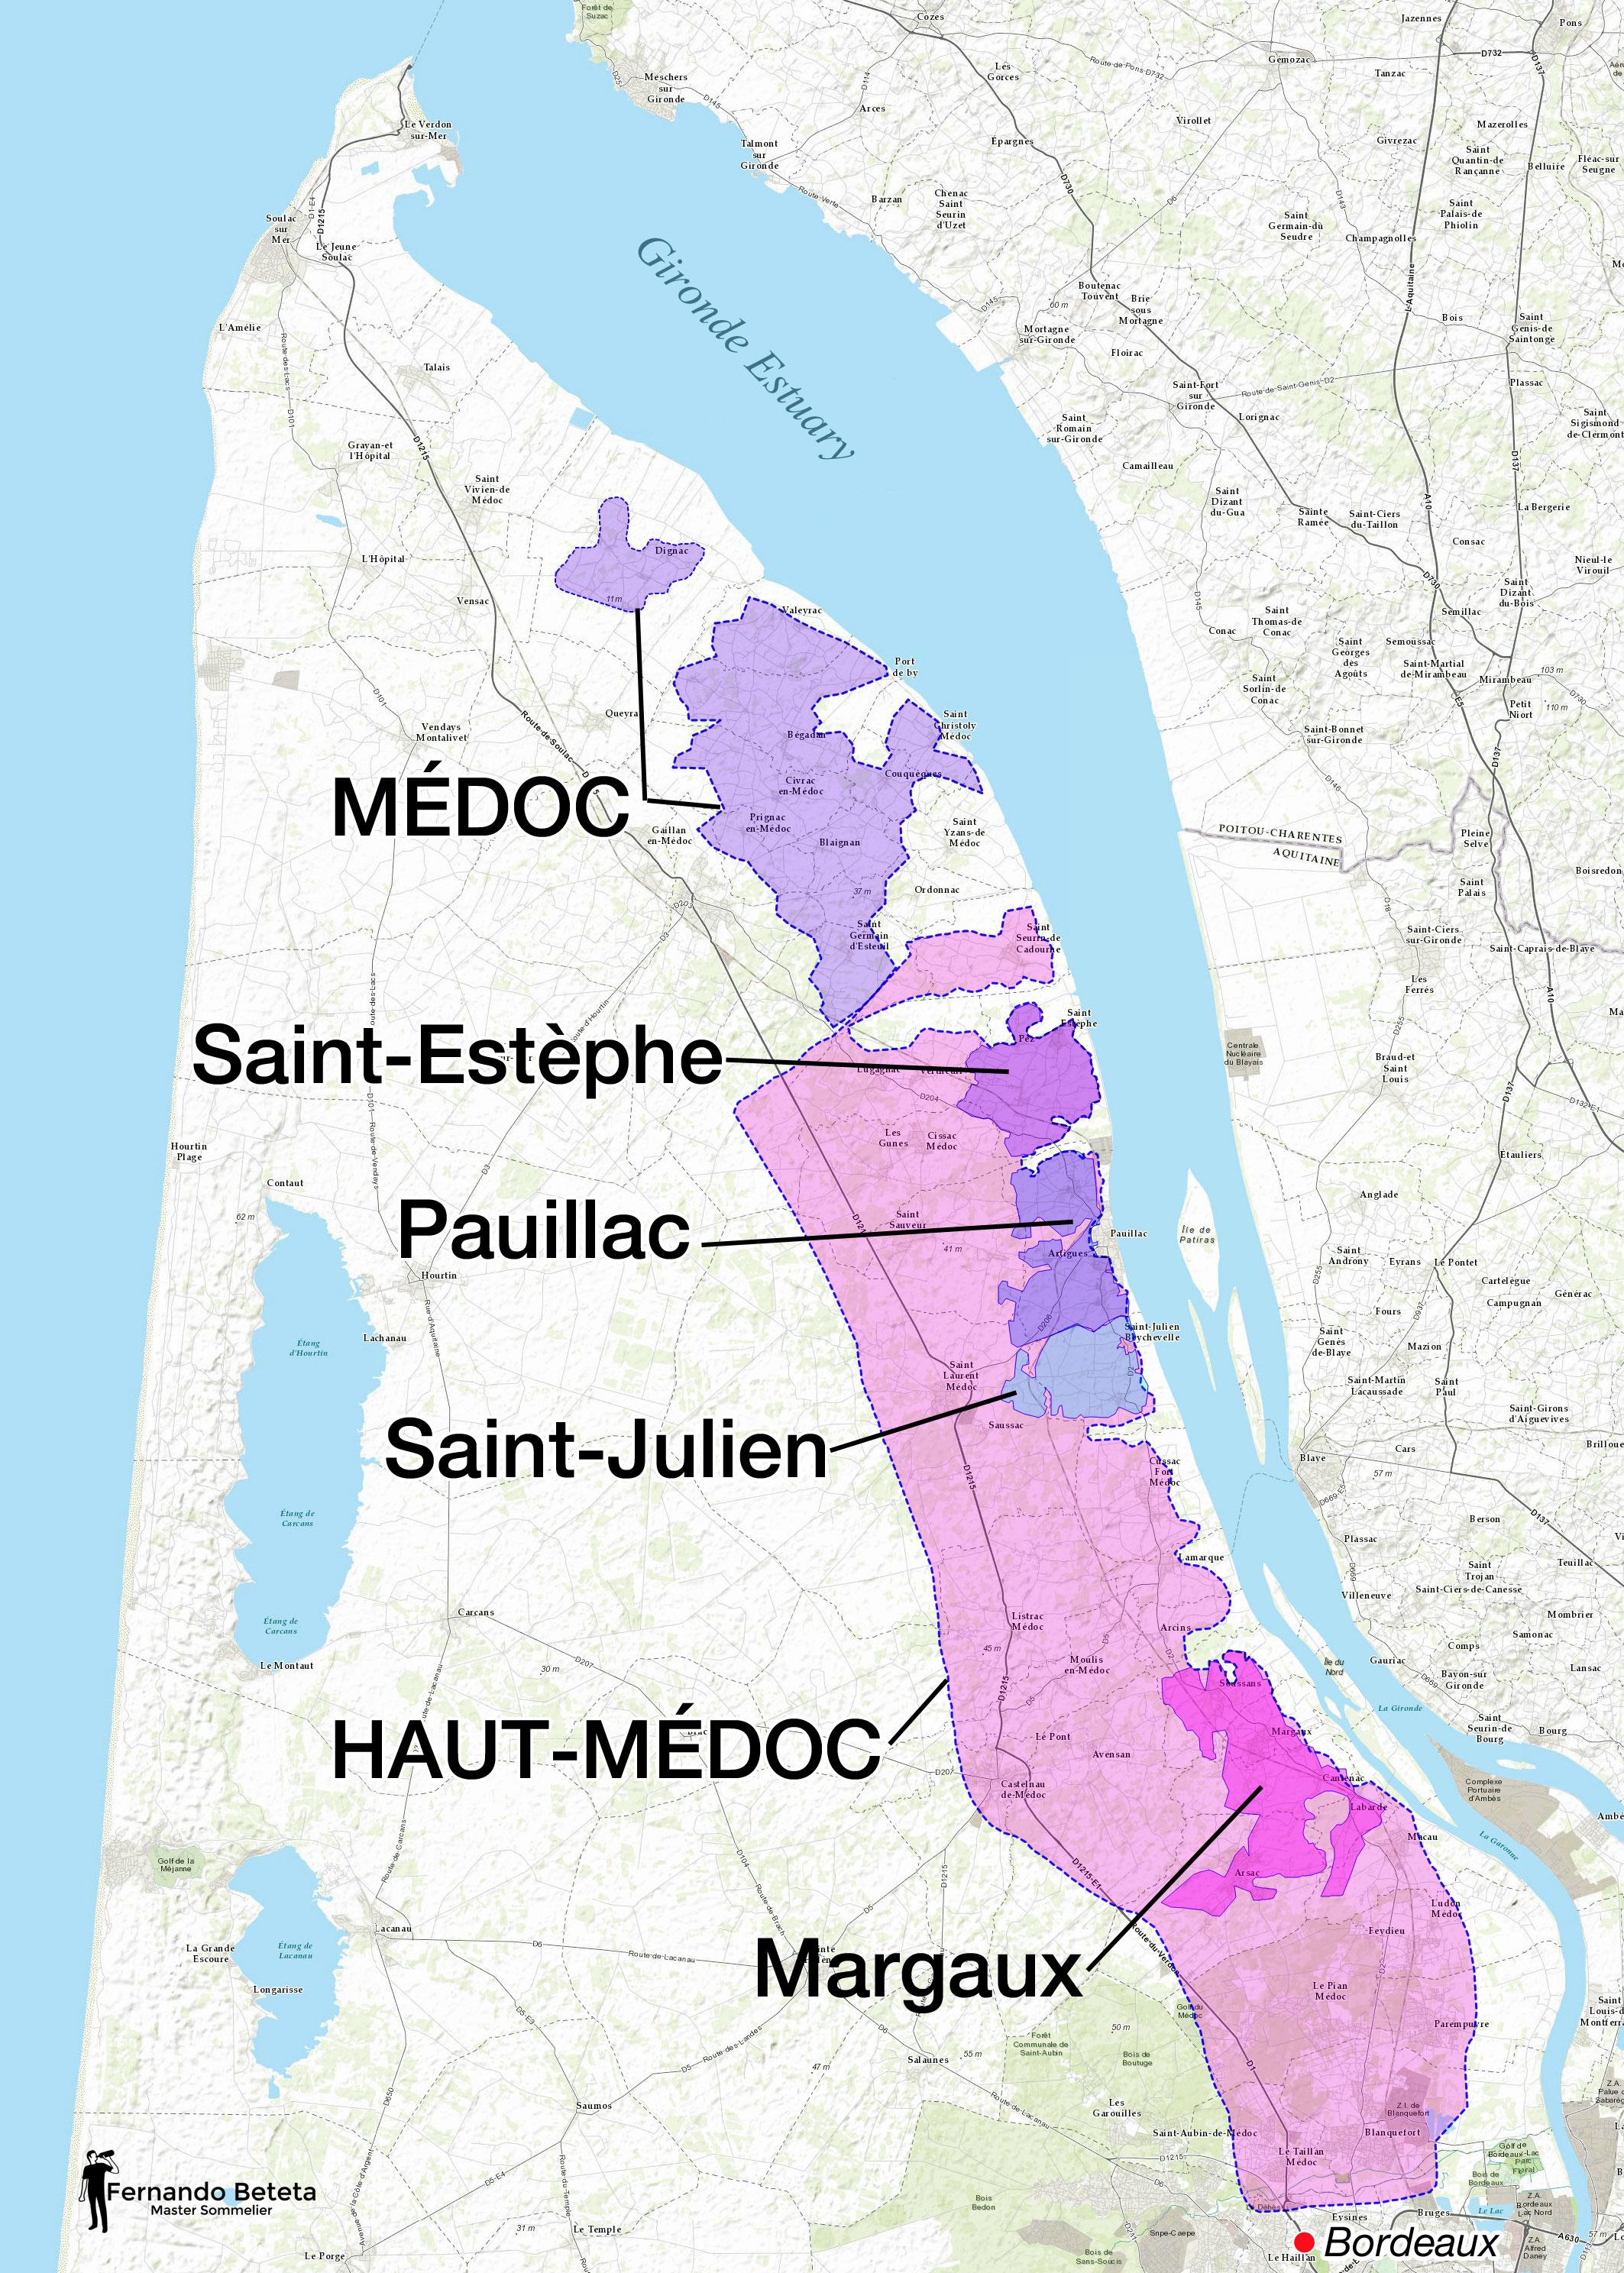 France - Bordeaux Médoc